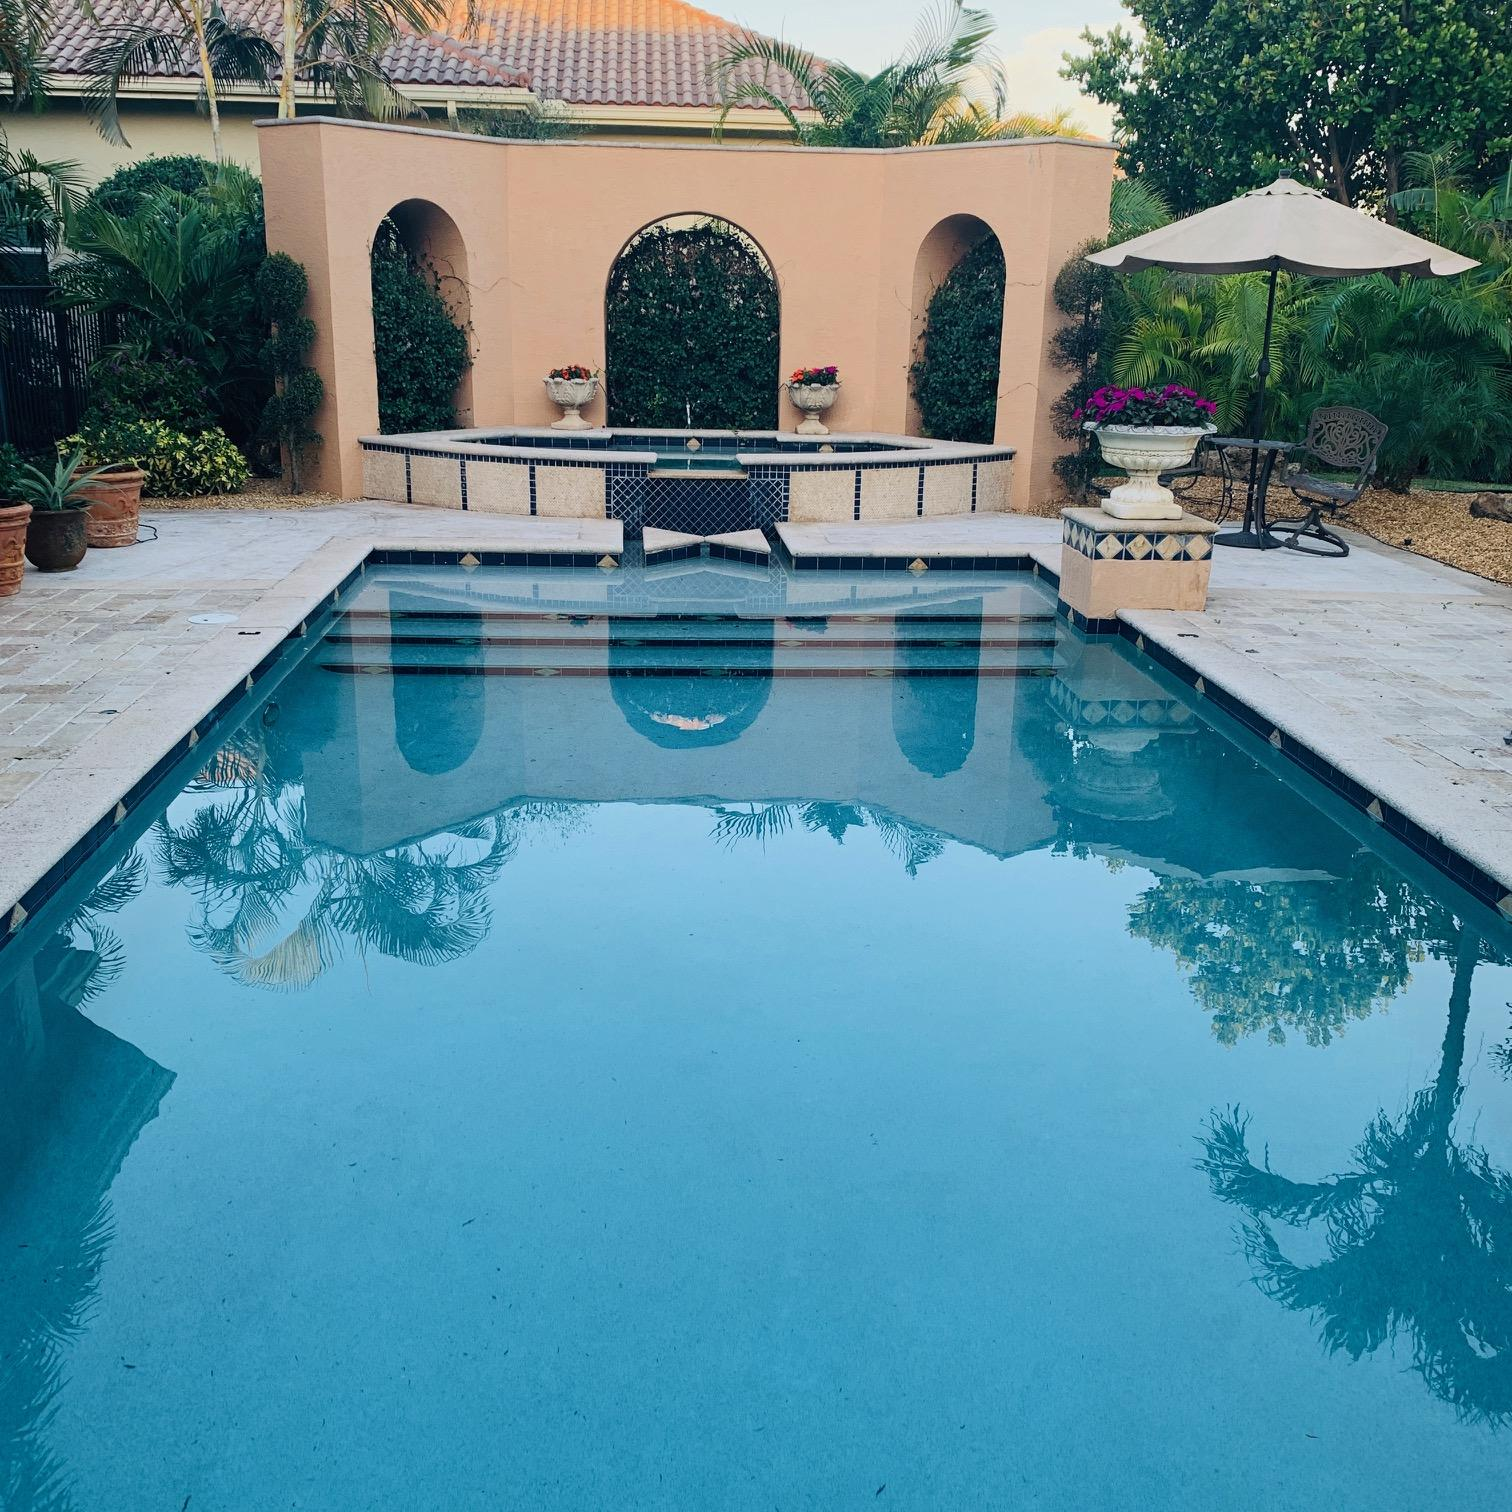 ISLES WELLINGTON FLORIDA